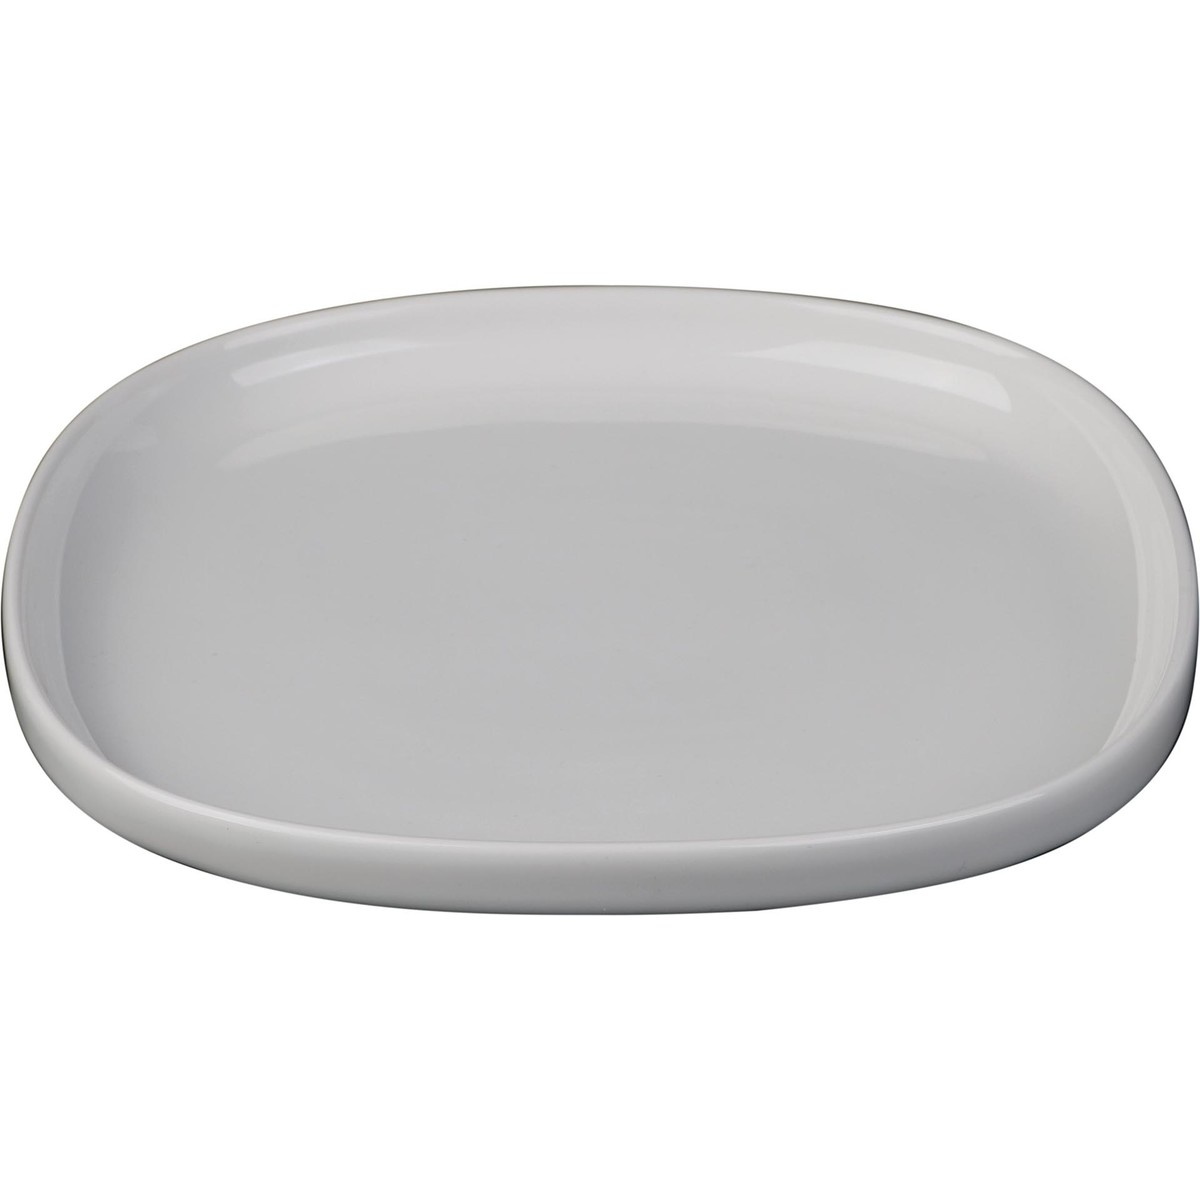 "Porzellanserie ""Skagen"" High Alumina  Teller 28,0 cm, weiß"